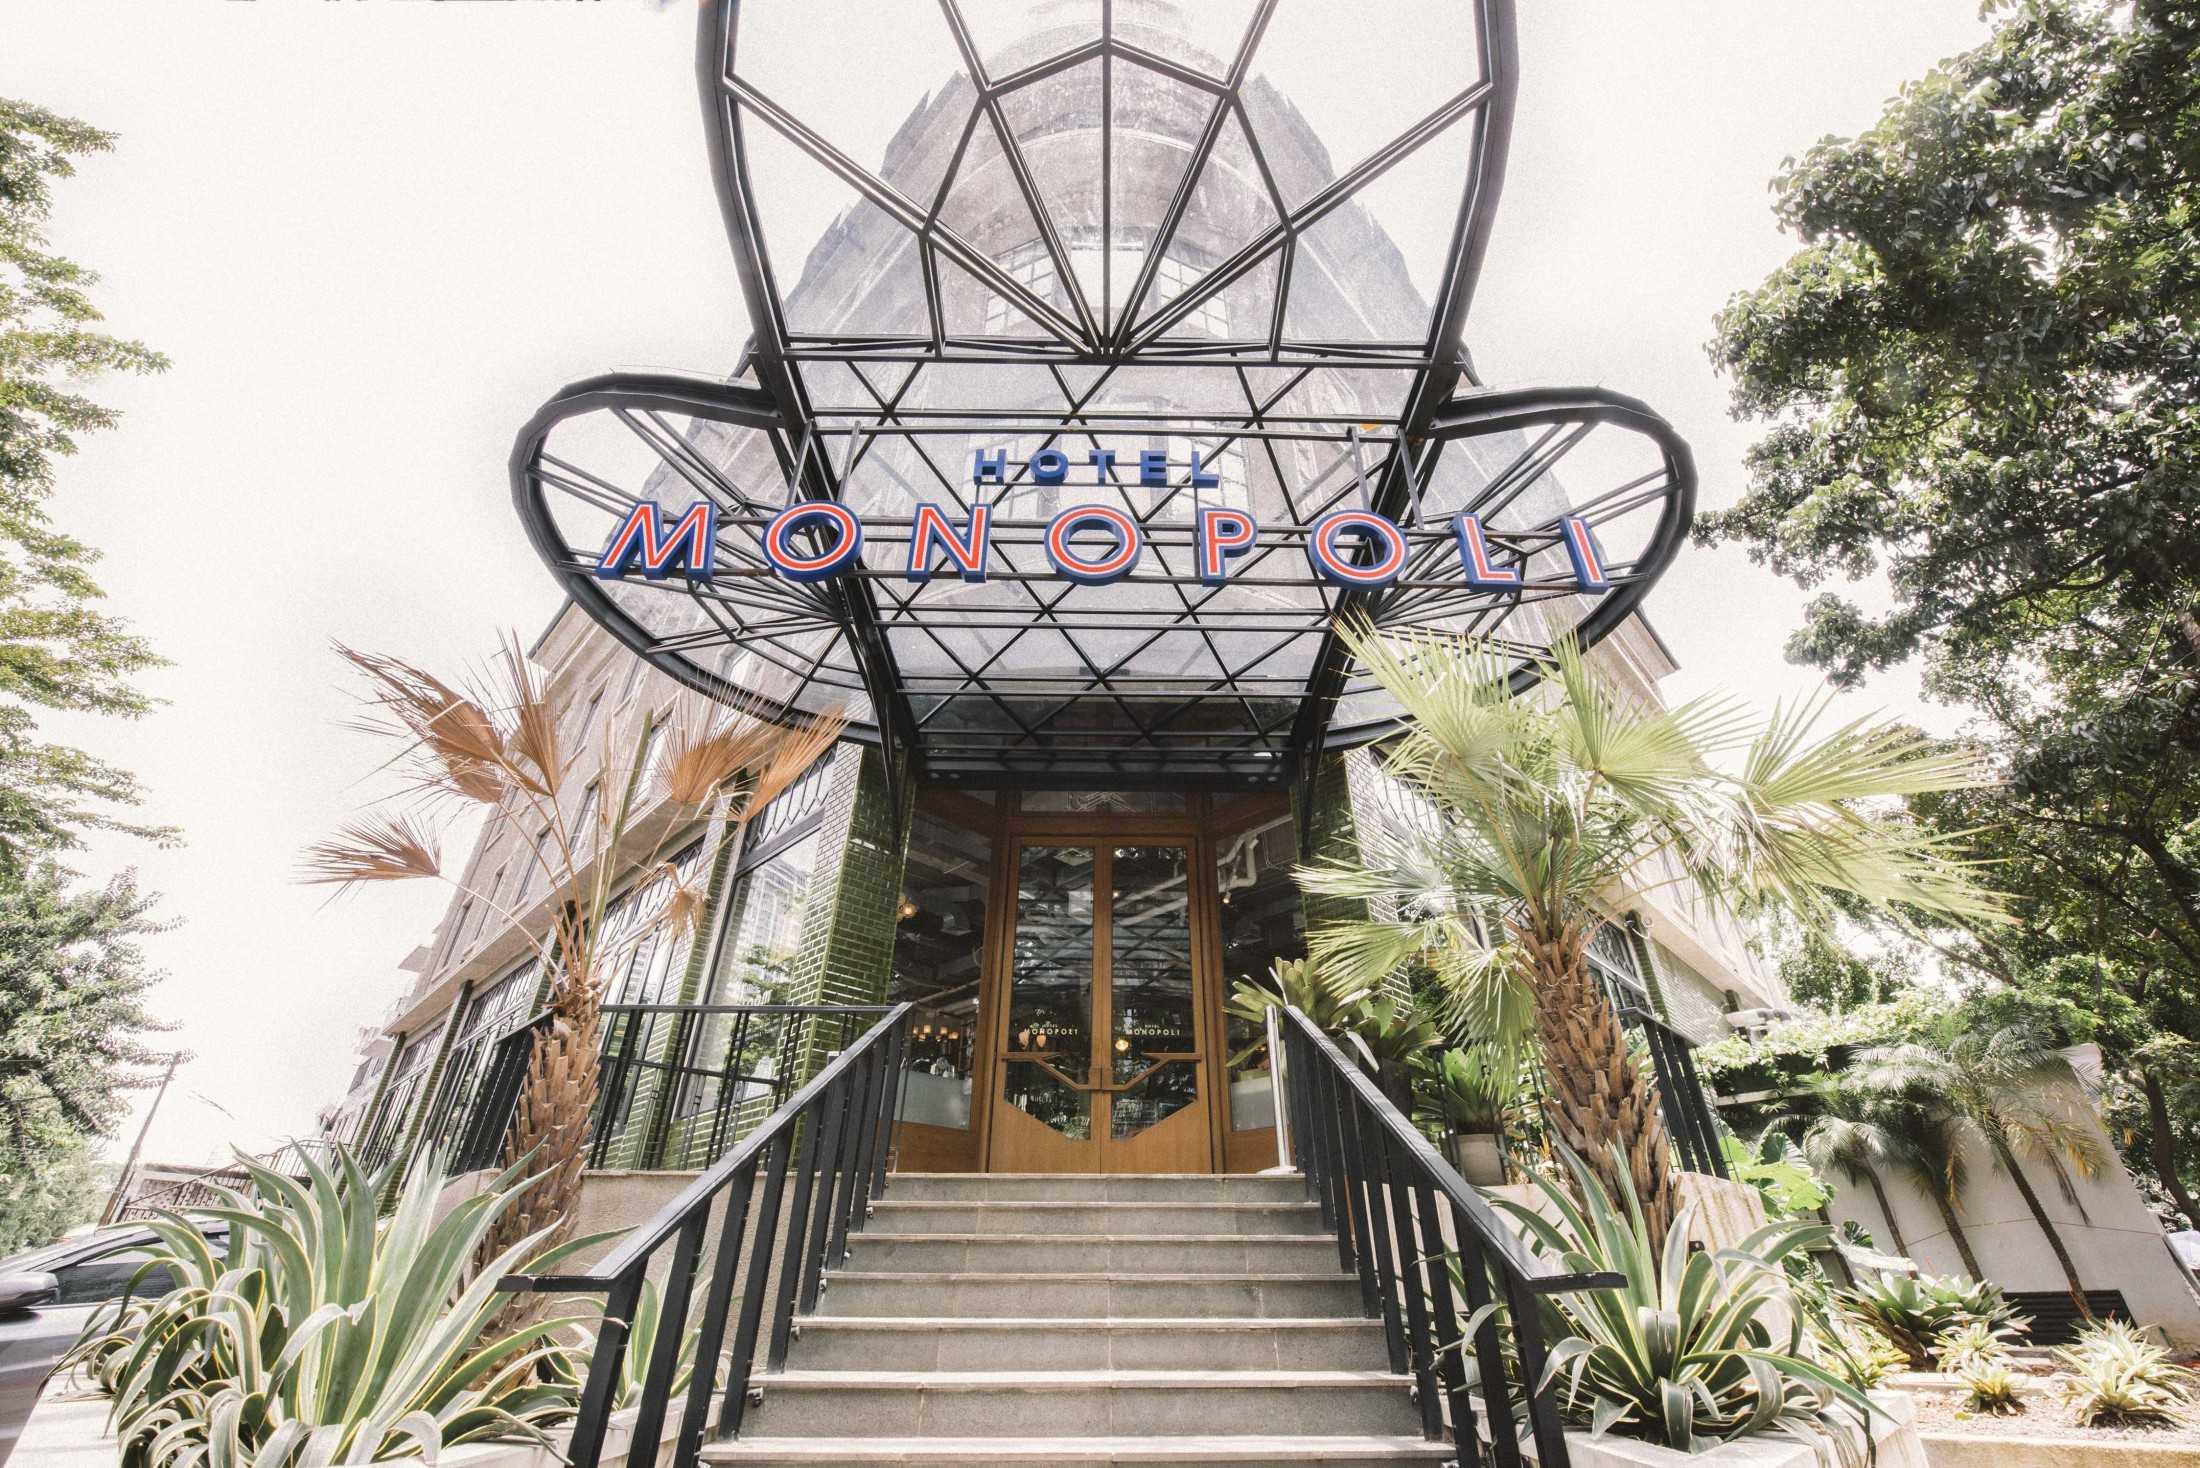 Archid Design&build Monopoli Hotel Kemang, Cipete Sel., Kec. Cilandak, Kota Jakarta Selatan, Daerah Khusus Ibukota Jakarta, Indonesia Kemang, Cipete Sel., Kec. Cilandak, Kota Jakarta Selatan, Daerah Khusus Ibukota Jakarta, Indonesia Archid-Design-Build-Monopoli-Hotel  88047